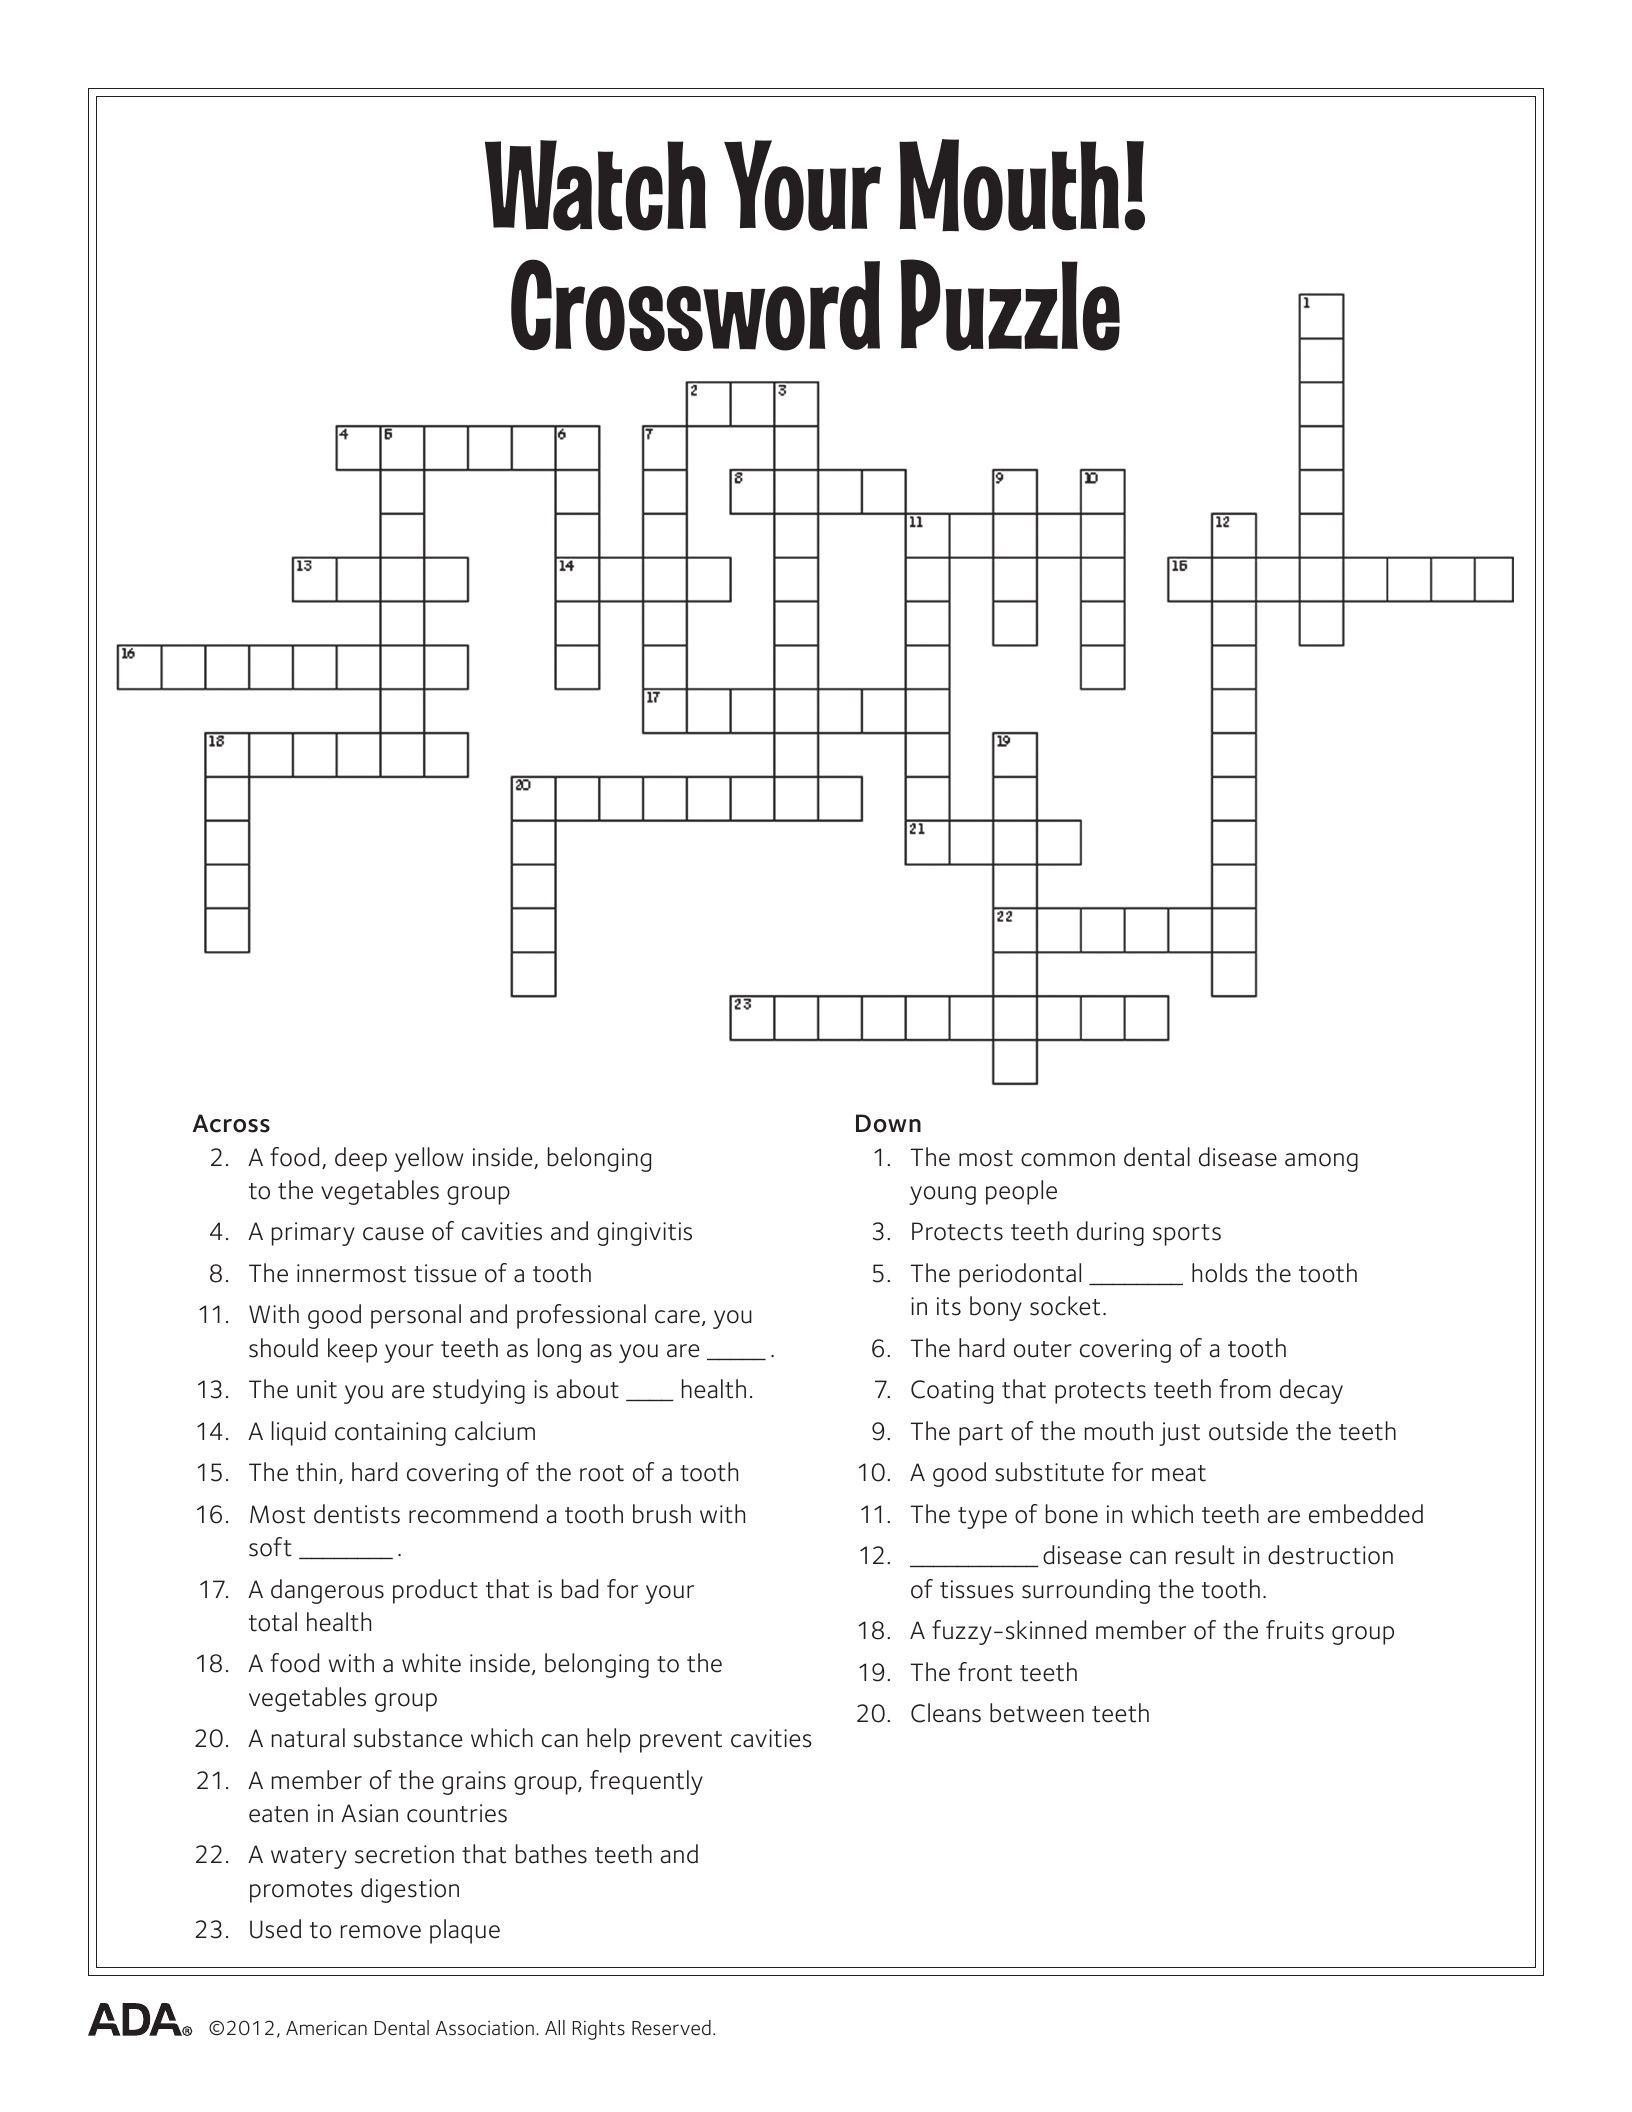 11 Dental Health Activities Puzzle Fun (Printable) | Dental Hygiene - Printable Health Crossword Puzzles